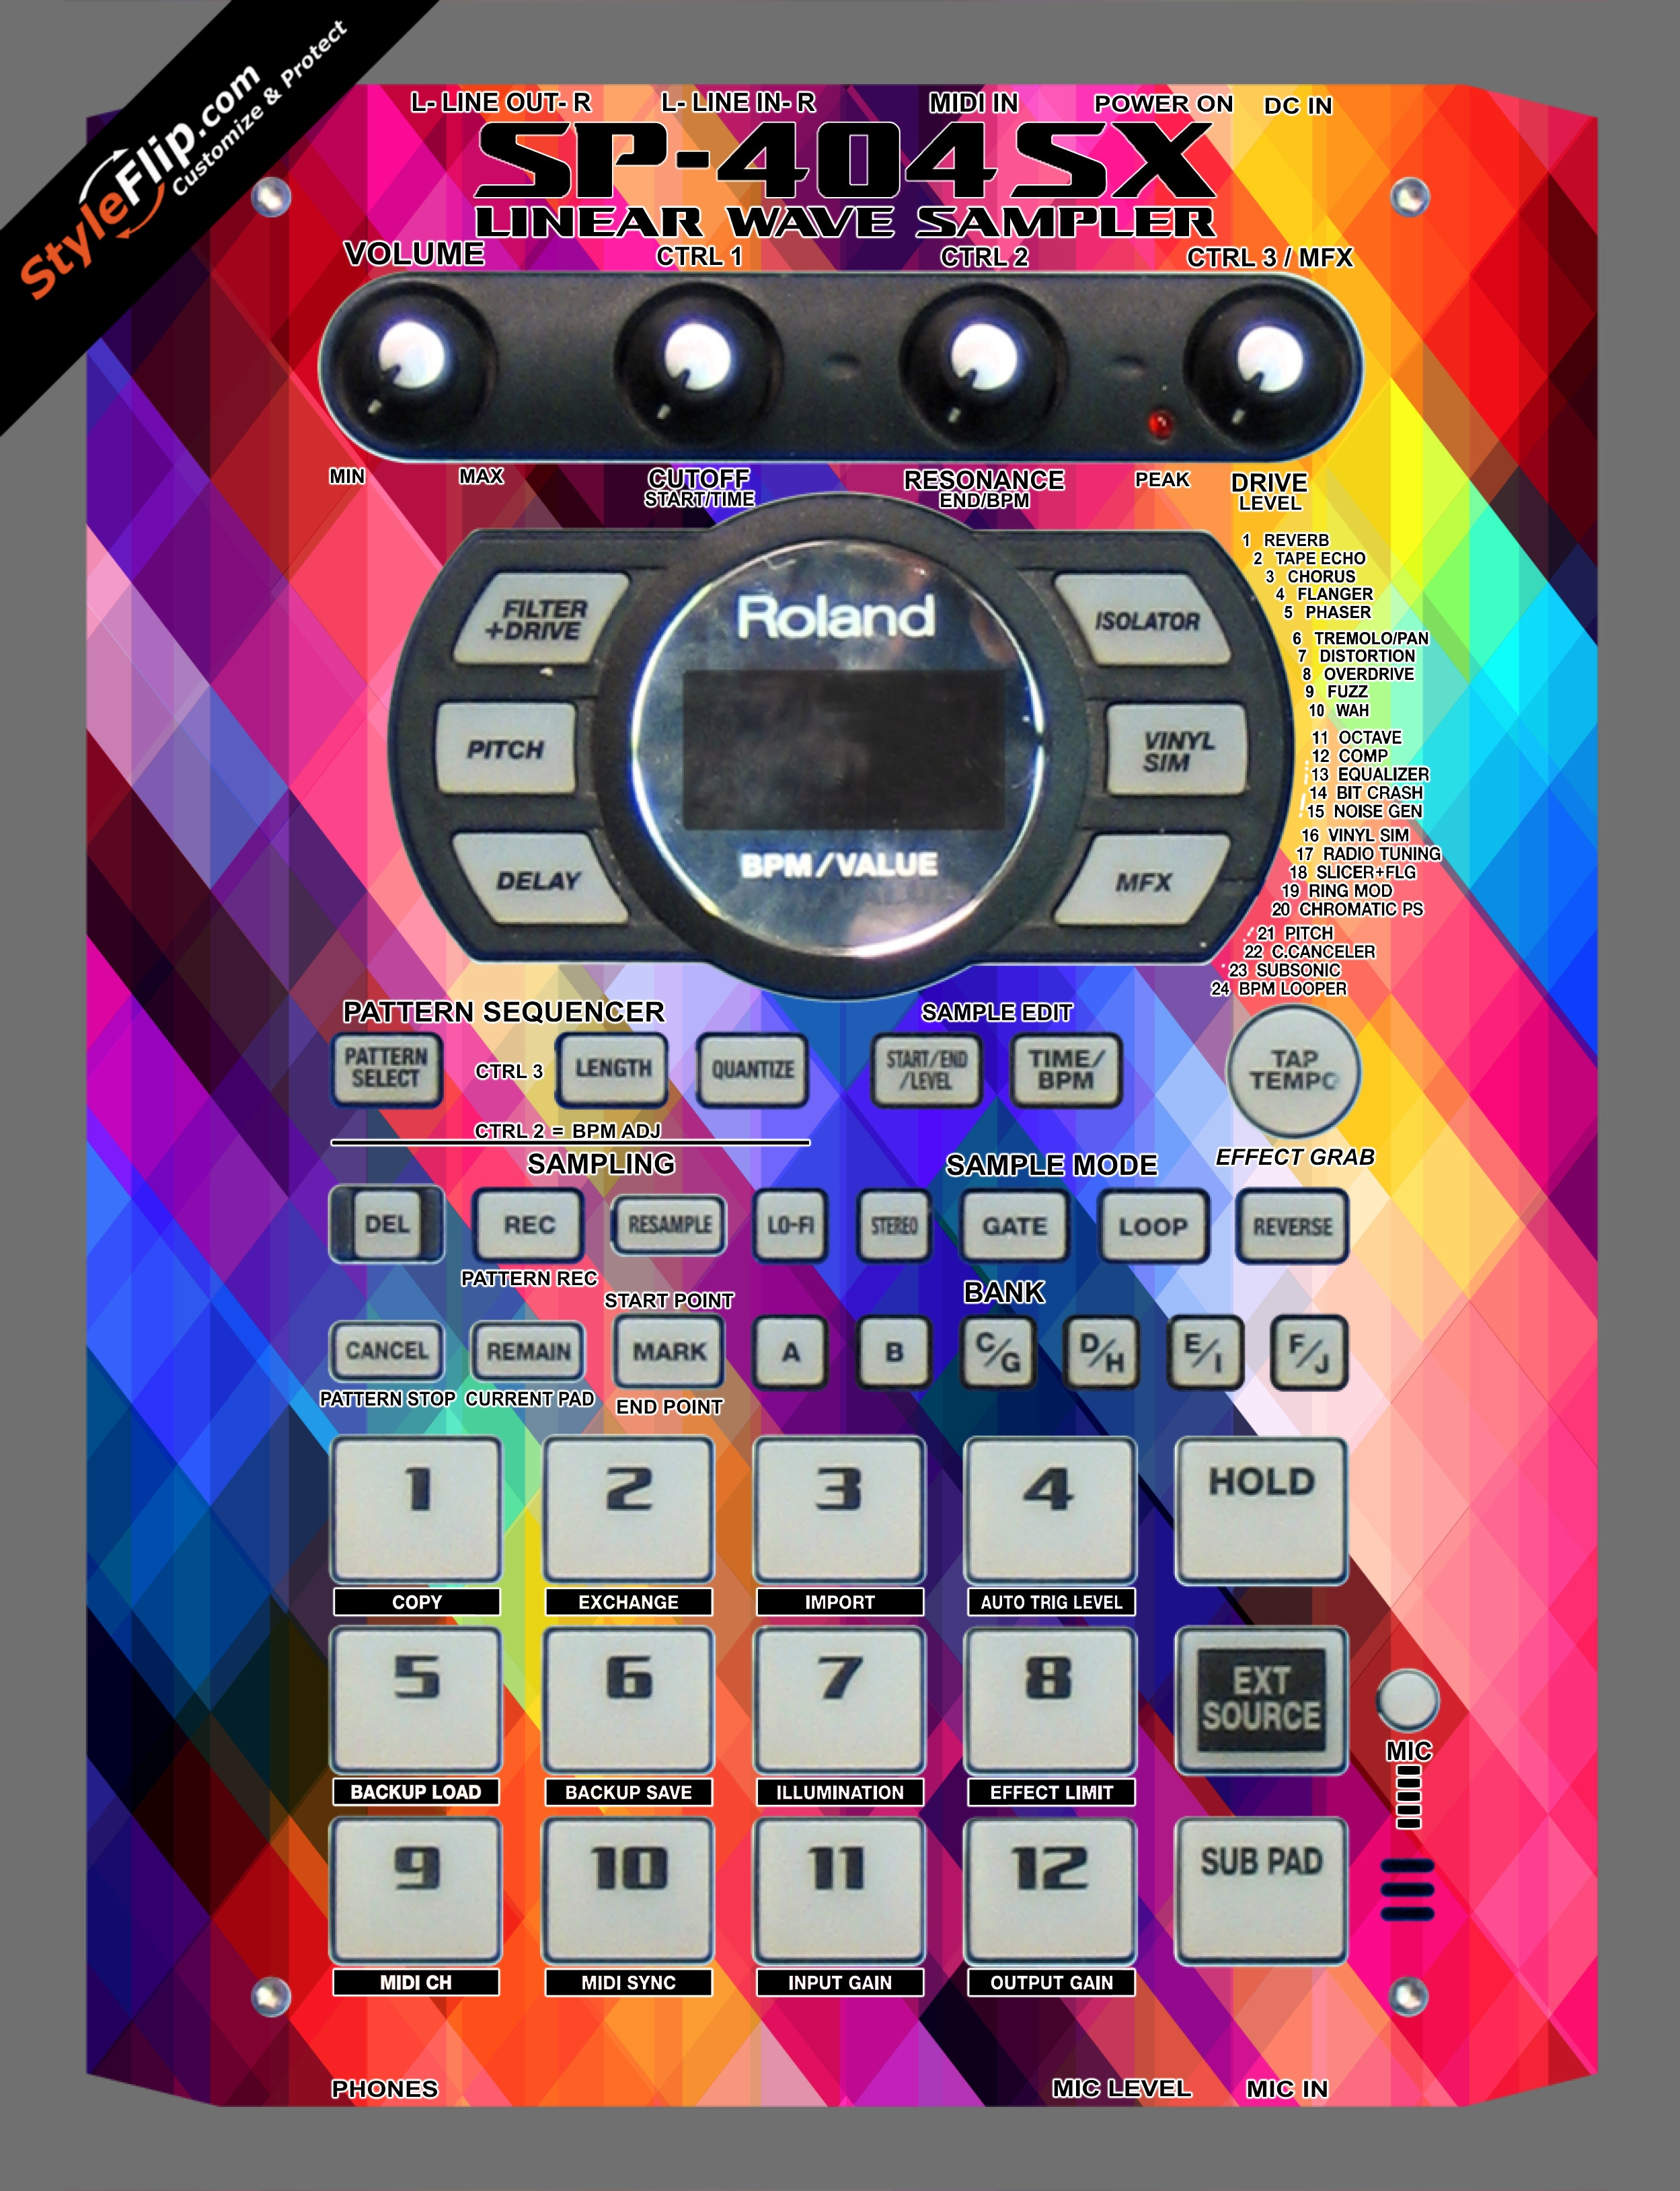 Pixalated Roland SP-404 SX